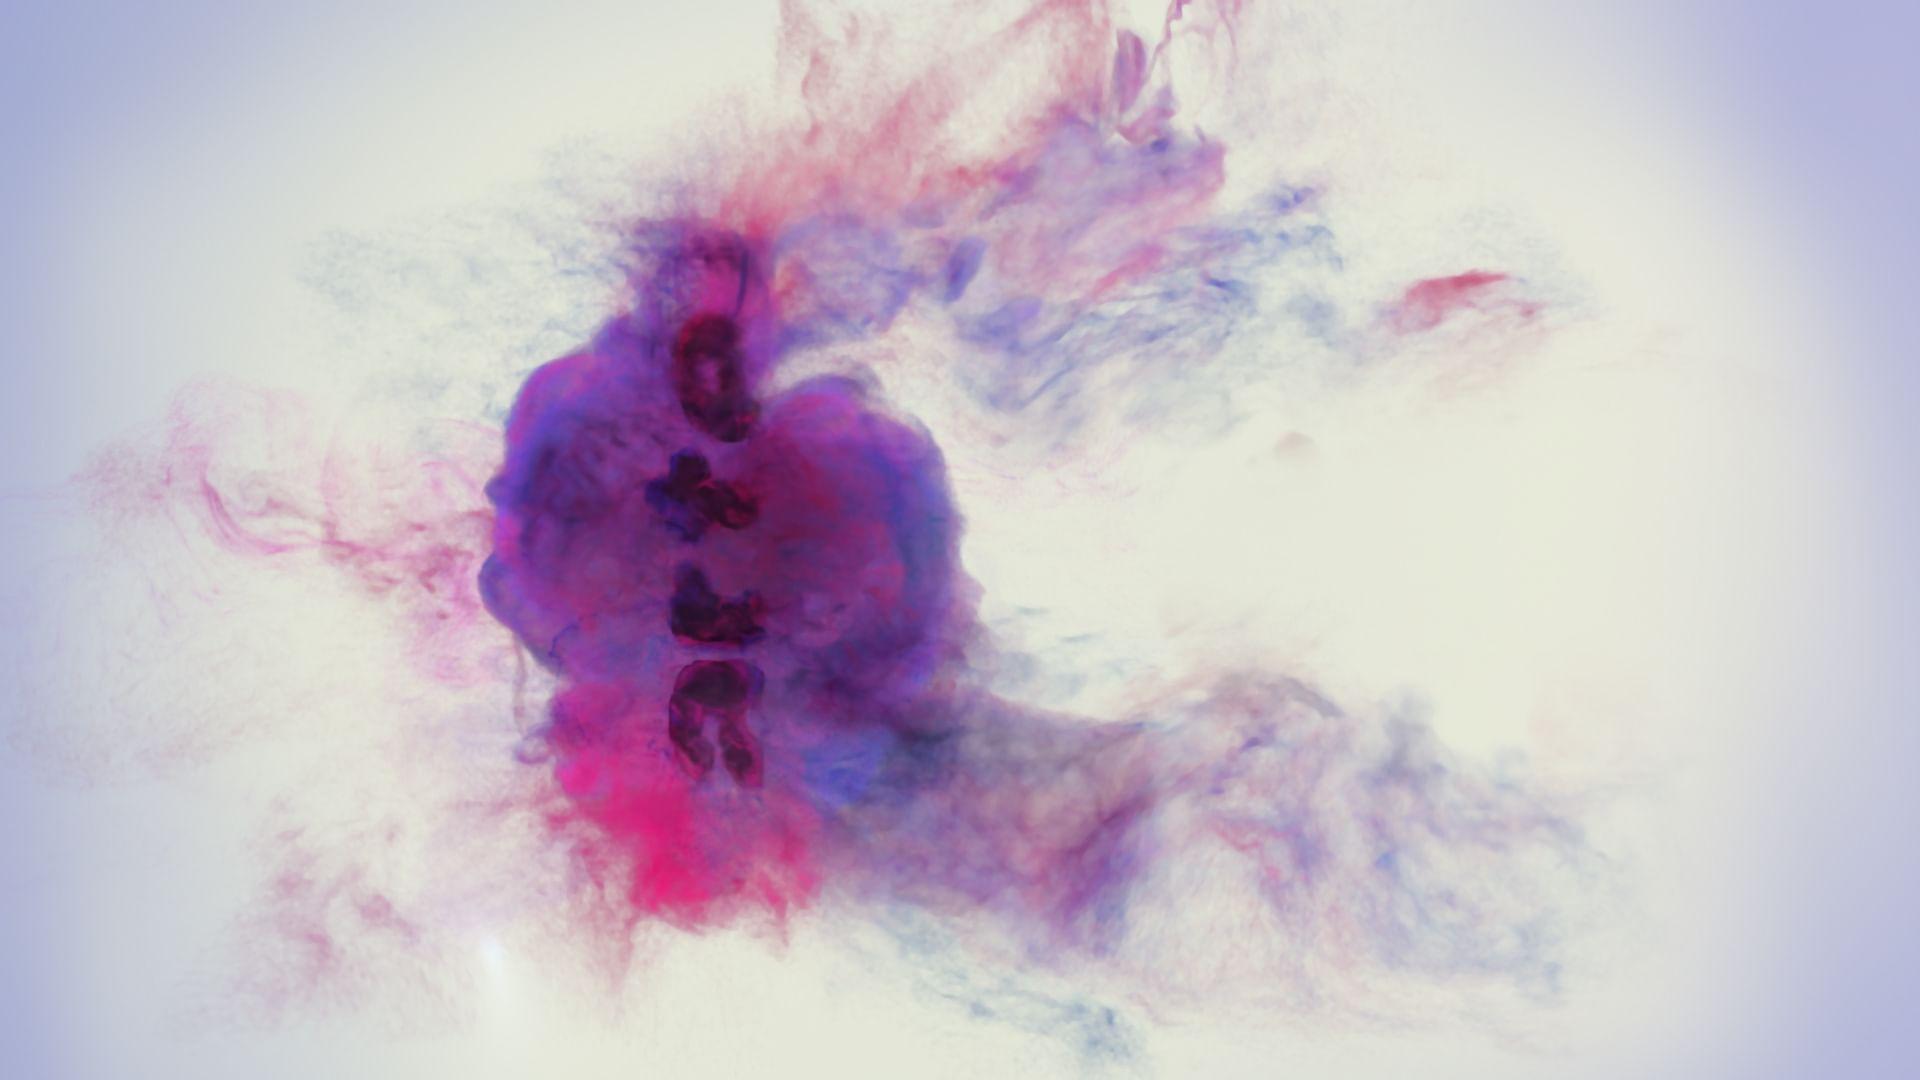 Art of Gaming - Horror Games